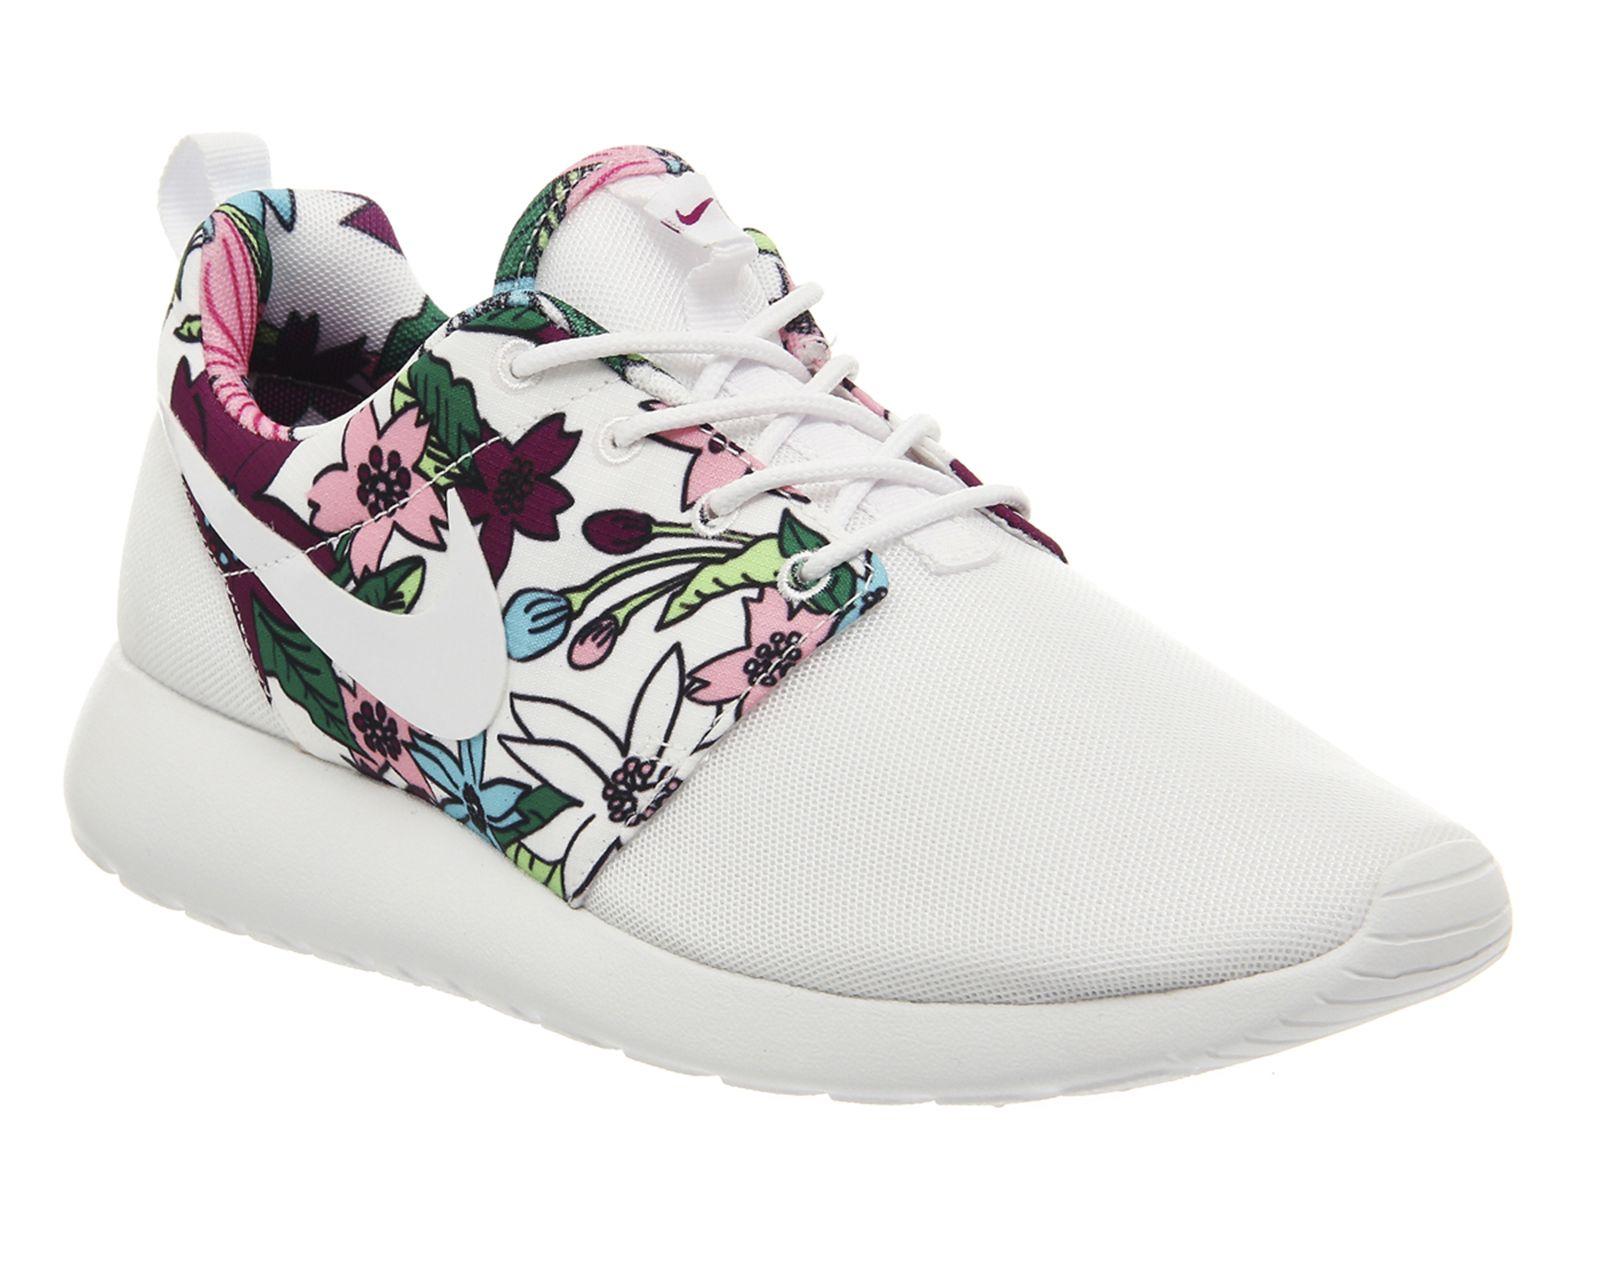 Nike Roshe Run Aloha White - Unisex Sports